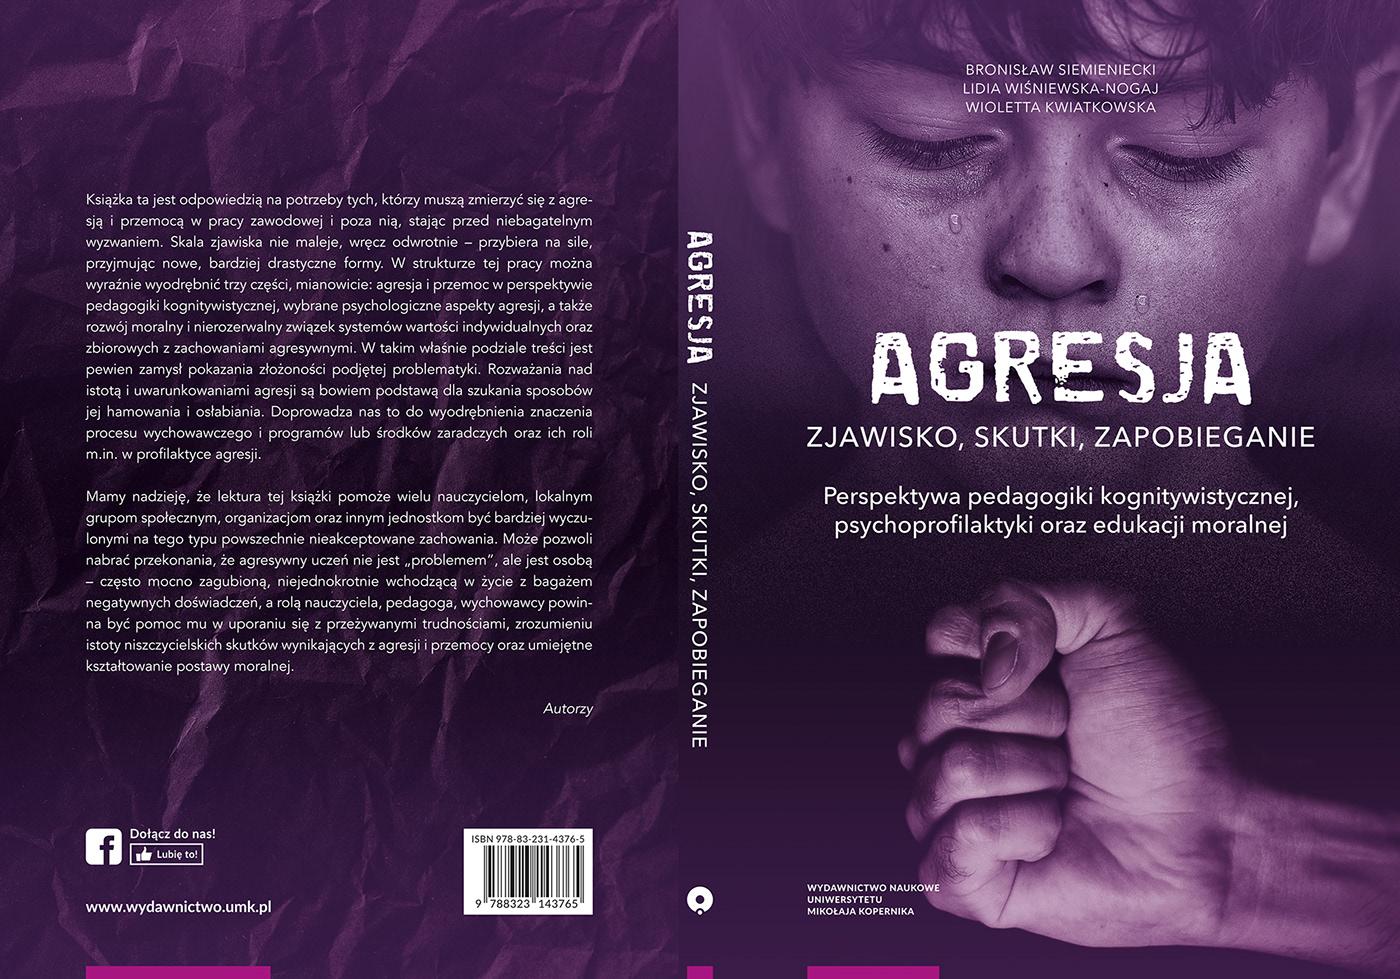 Aggression Archives book cover cyberaggression grafika książka National Park okładka okładka książki